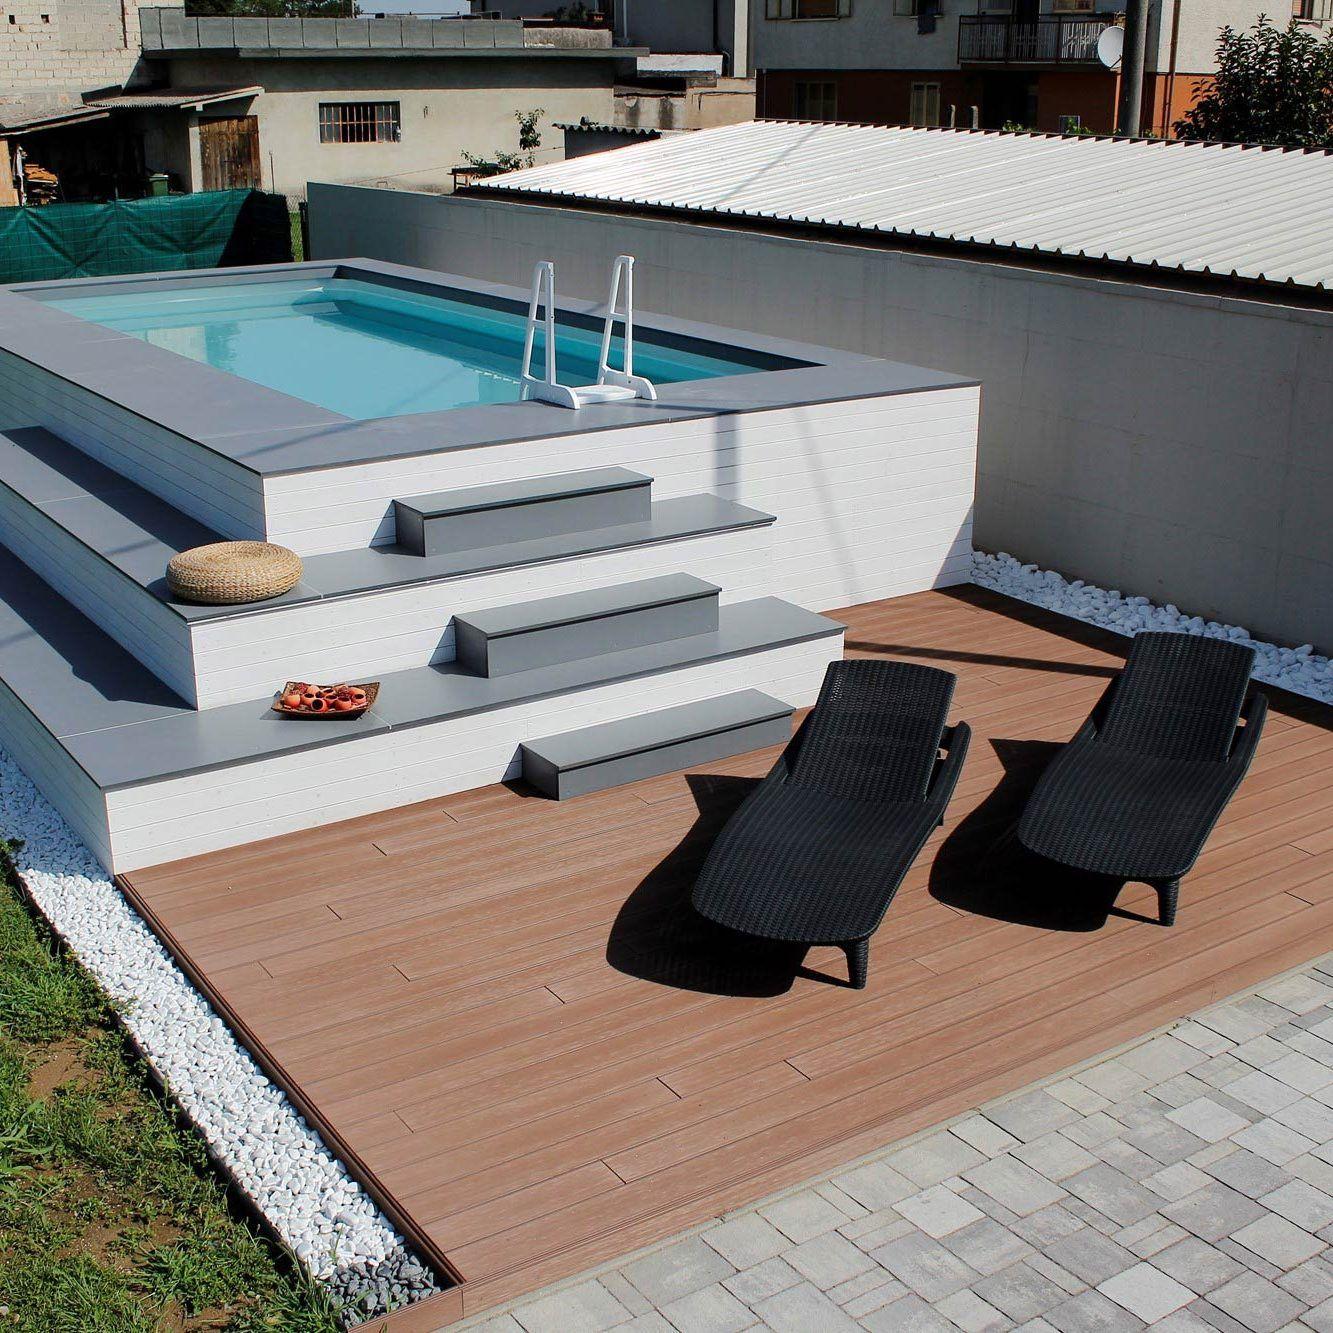 Arredi Per Piscine Esterne piscine fuoriterra | piscine, spazi esterni, piscina fuori terra